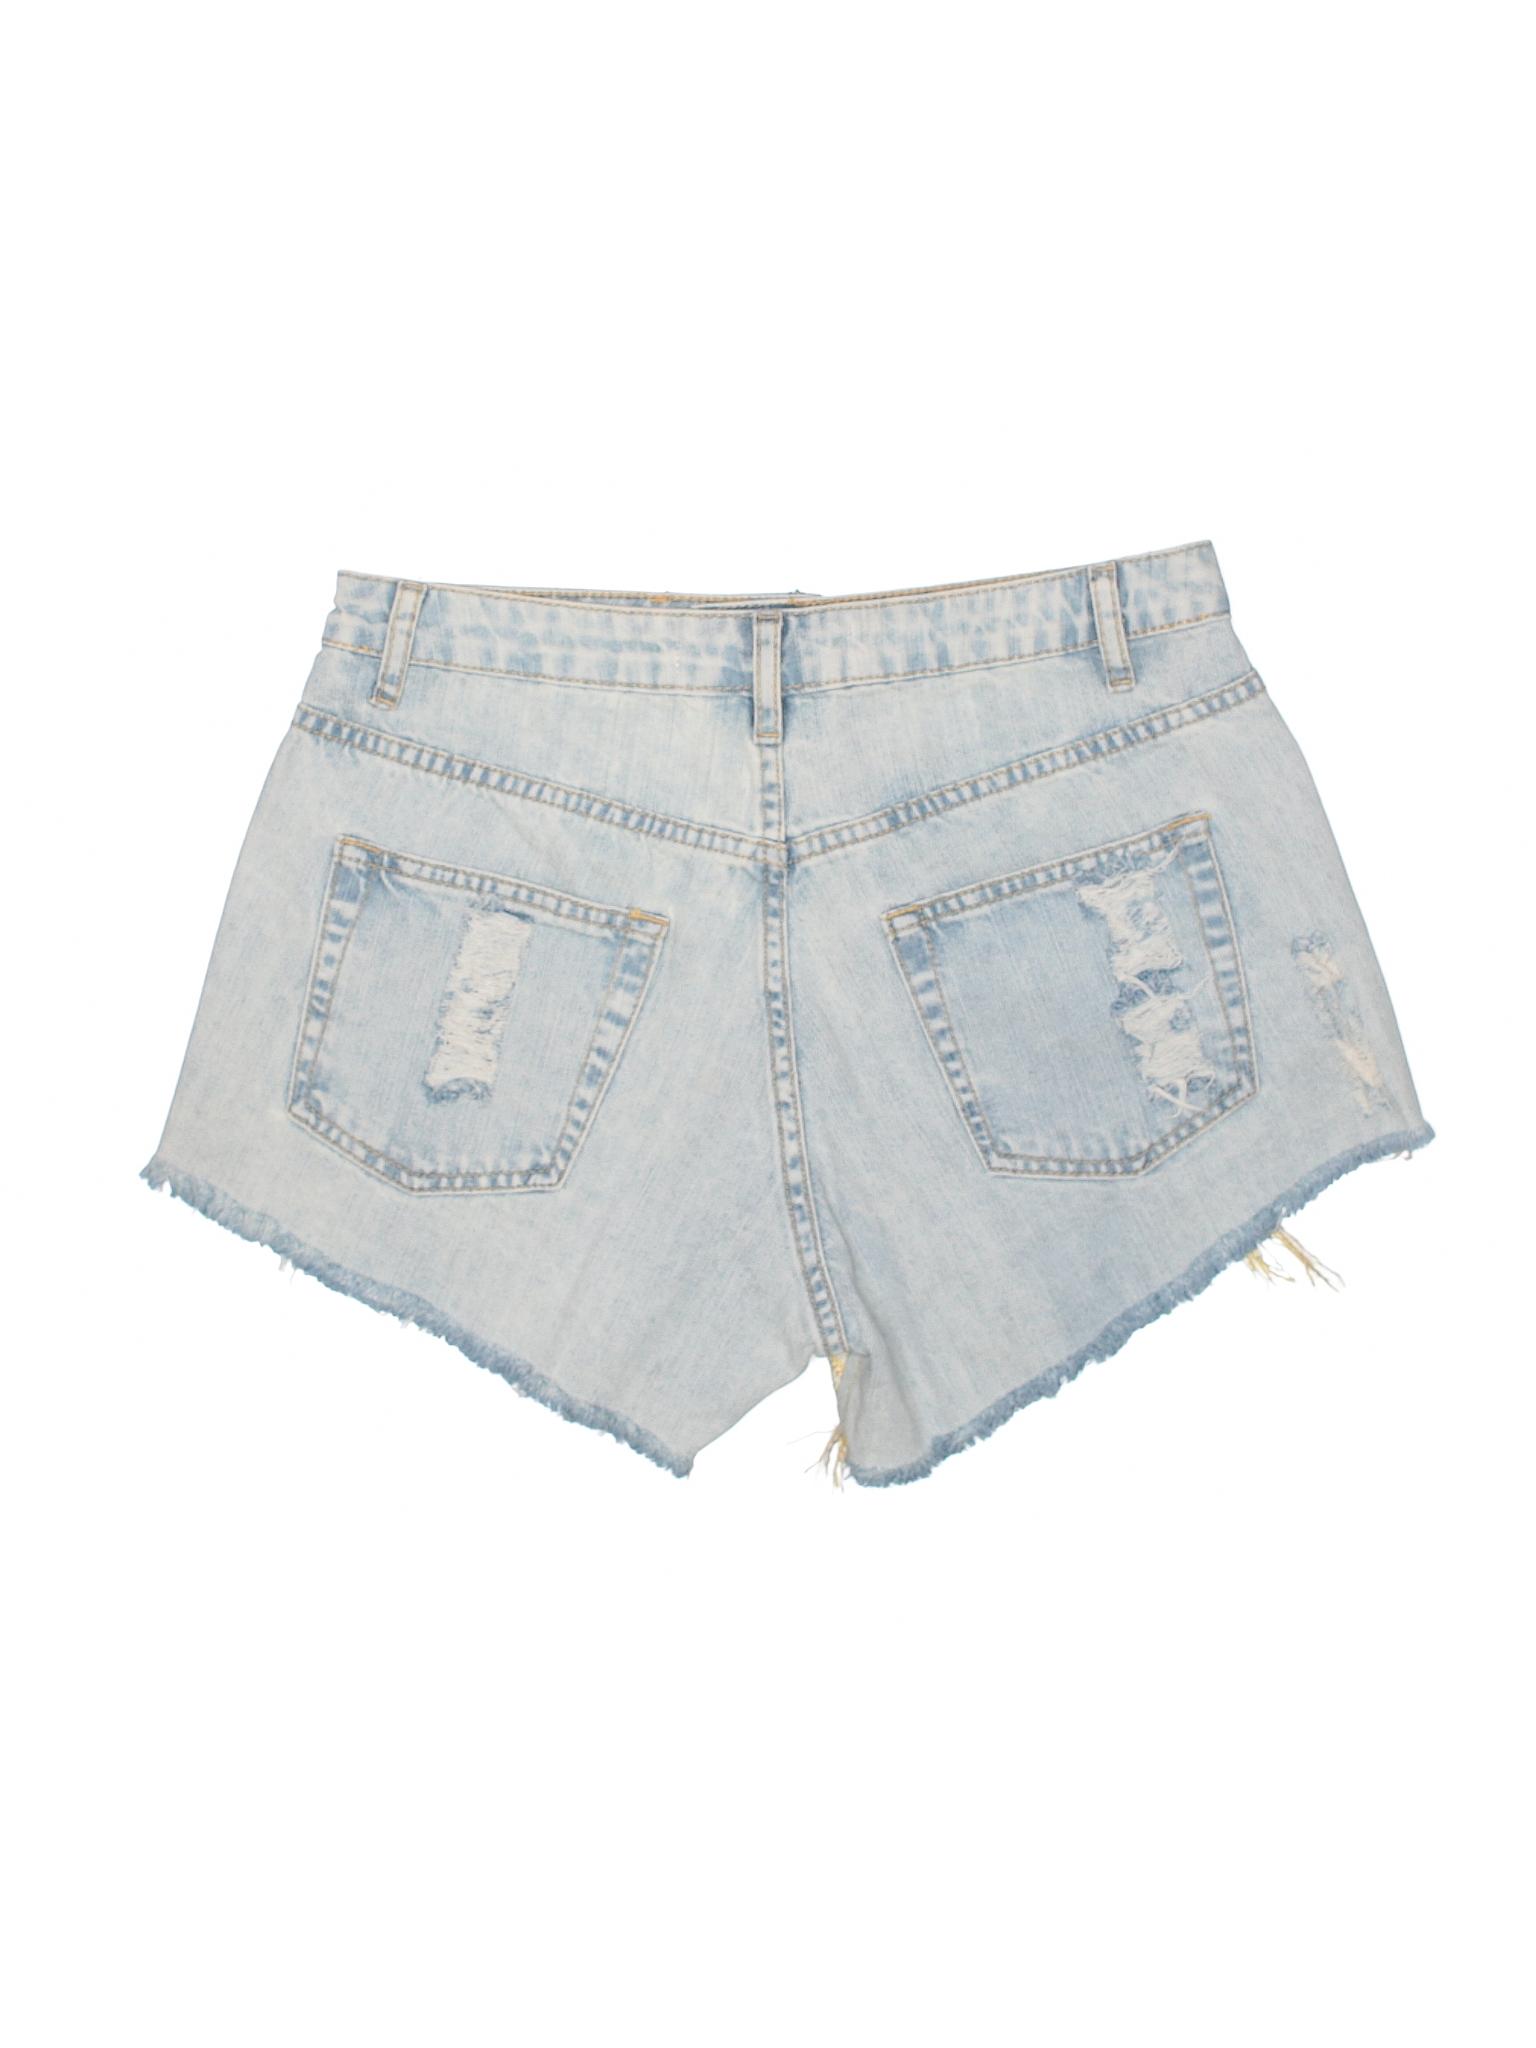 Shorts T Dress Boutique Denim Dress Denim Dress Denim Boutique T T Shorts Boutique T74qSXw